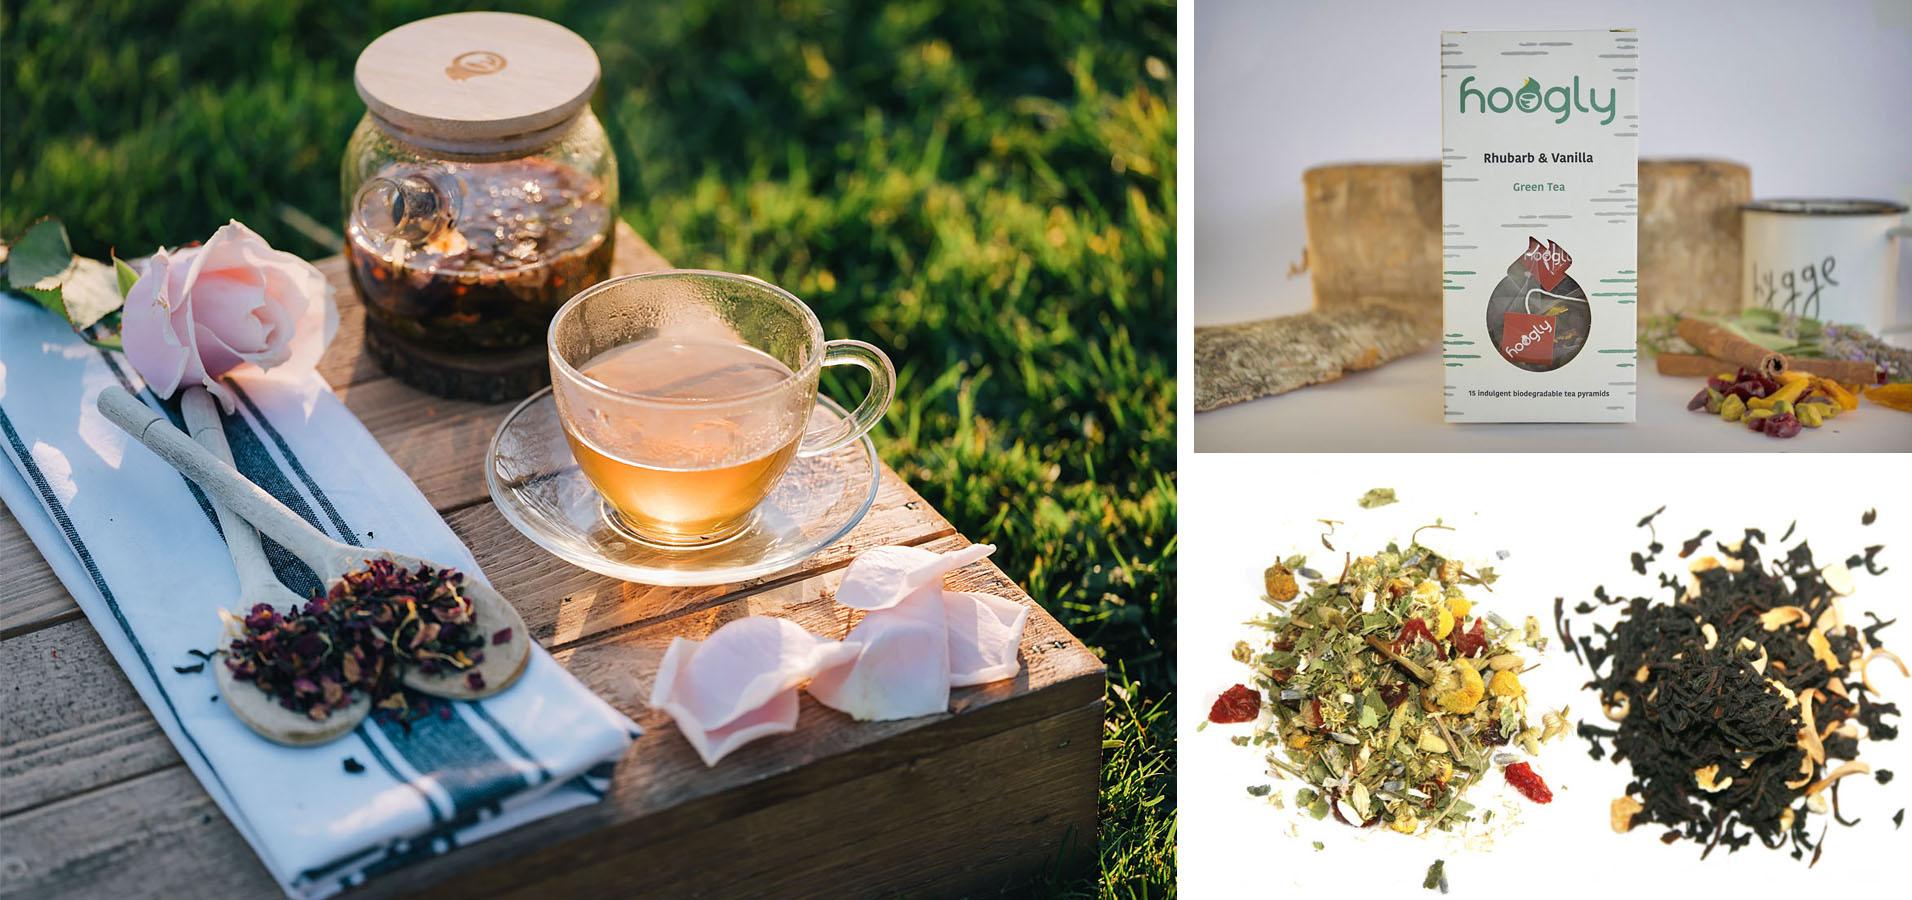 Hoogly Tea 2 - the artisan food trail